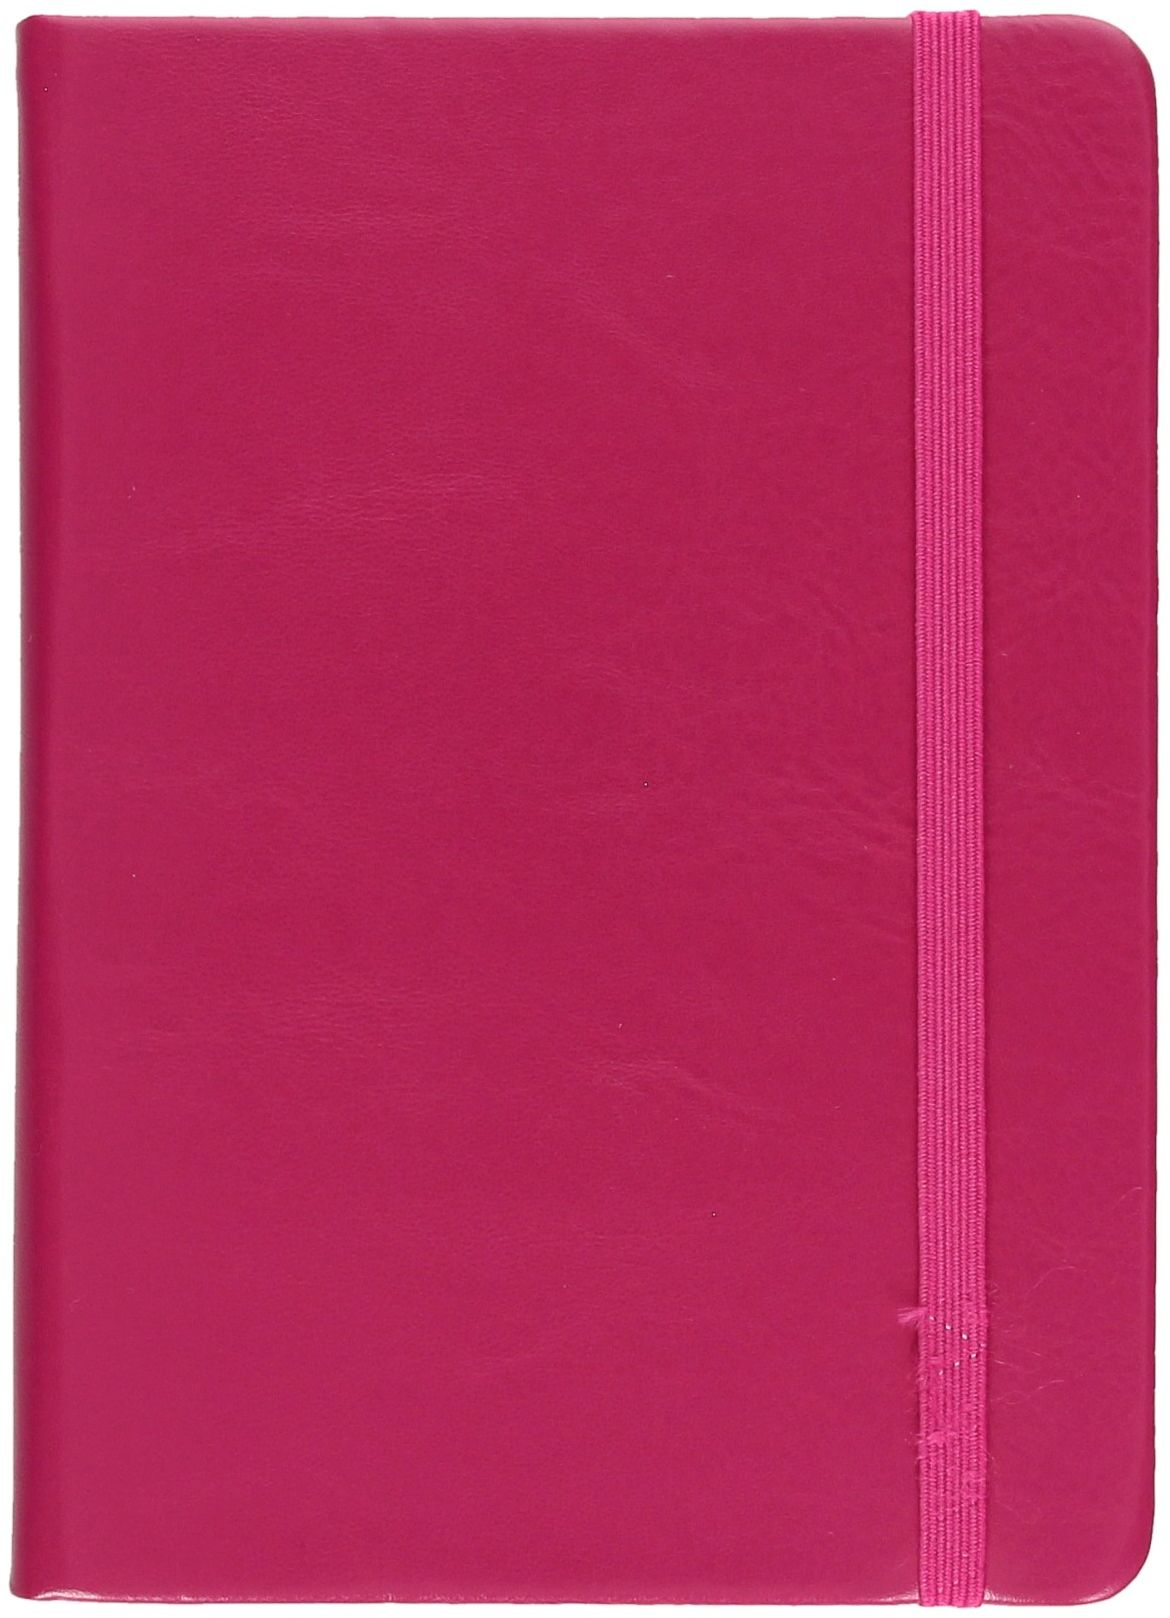 Notes A6/128 kratka różowy Berlin Hard